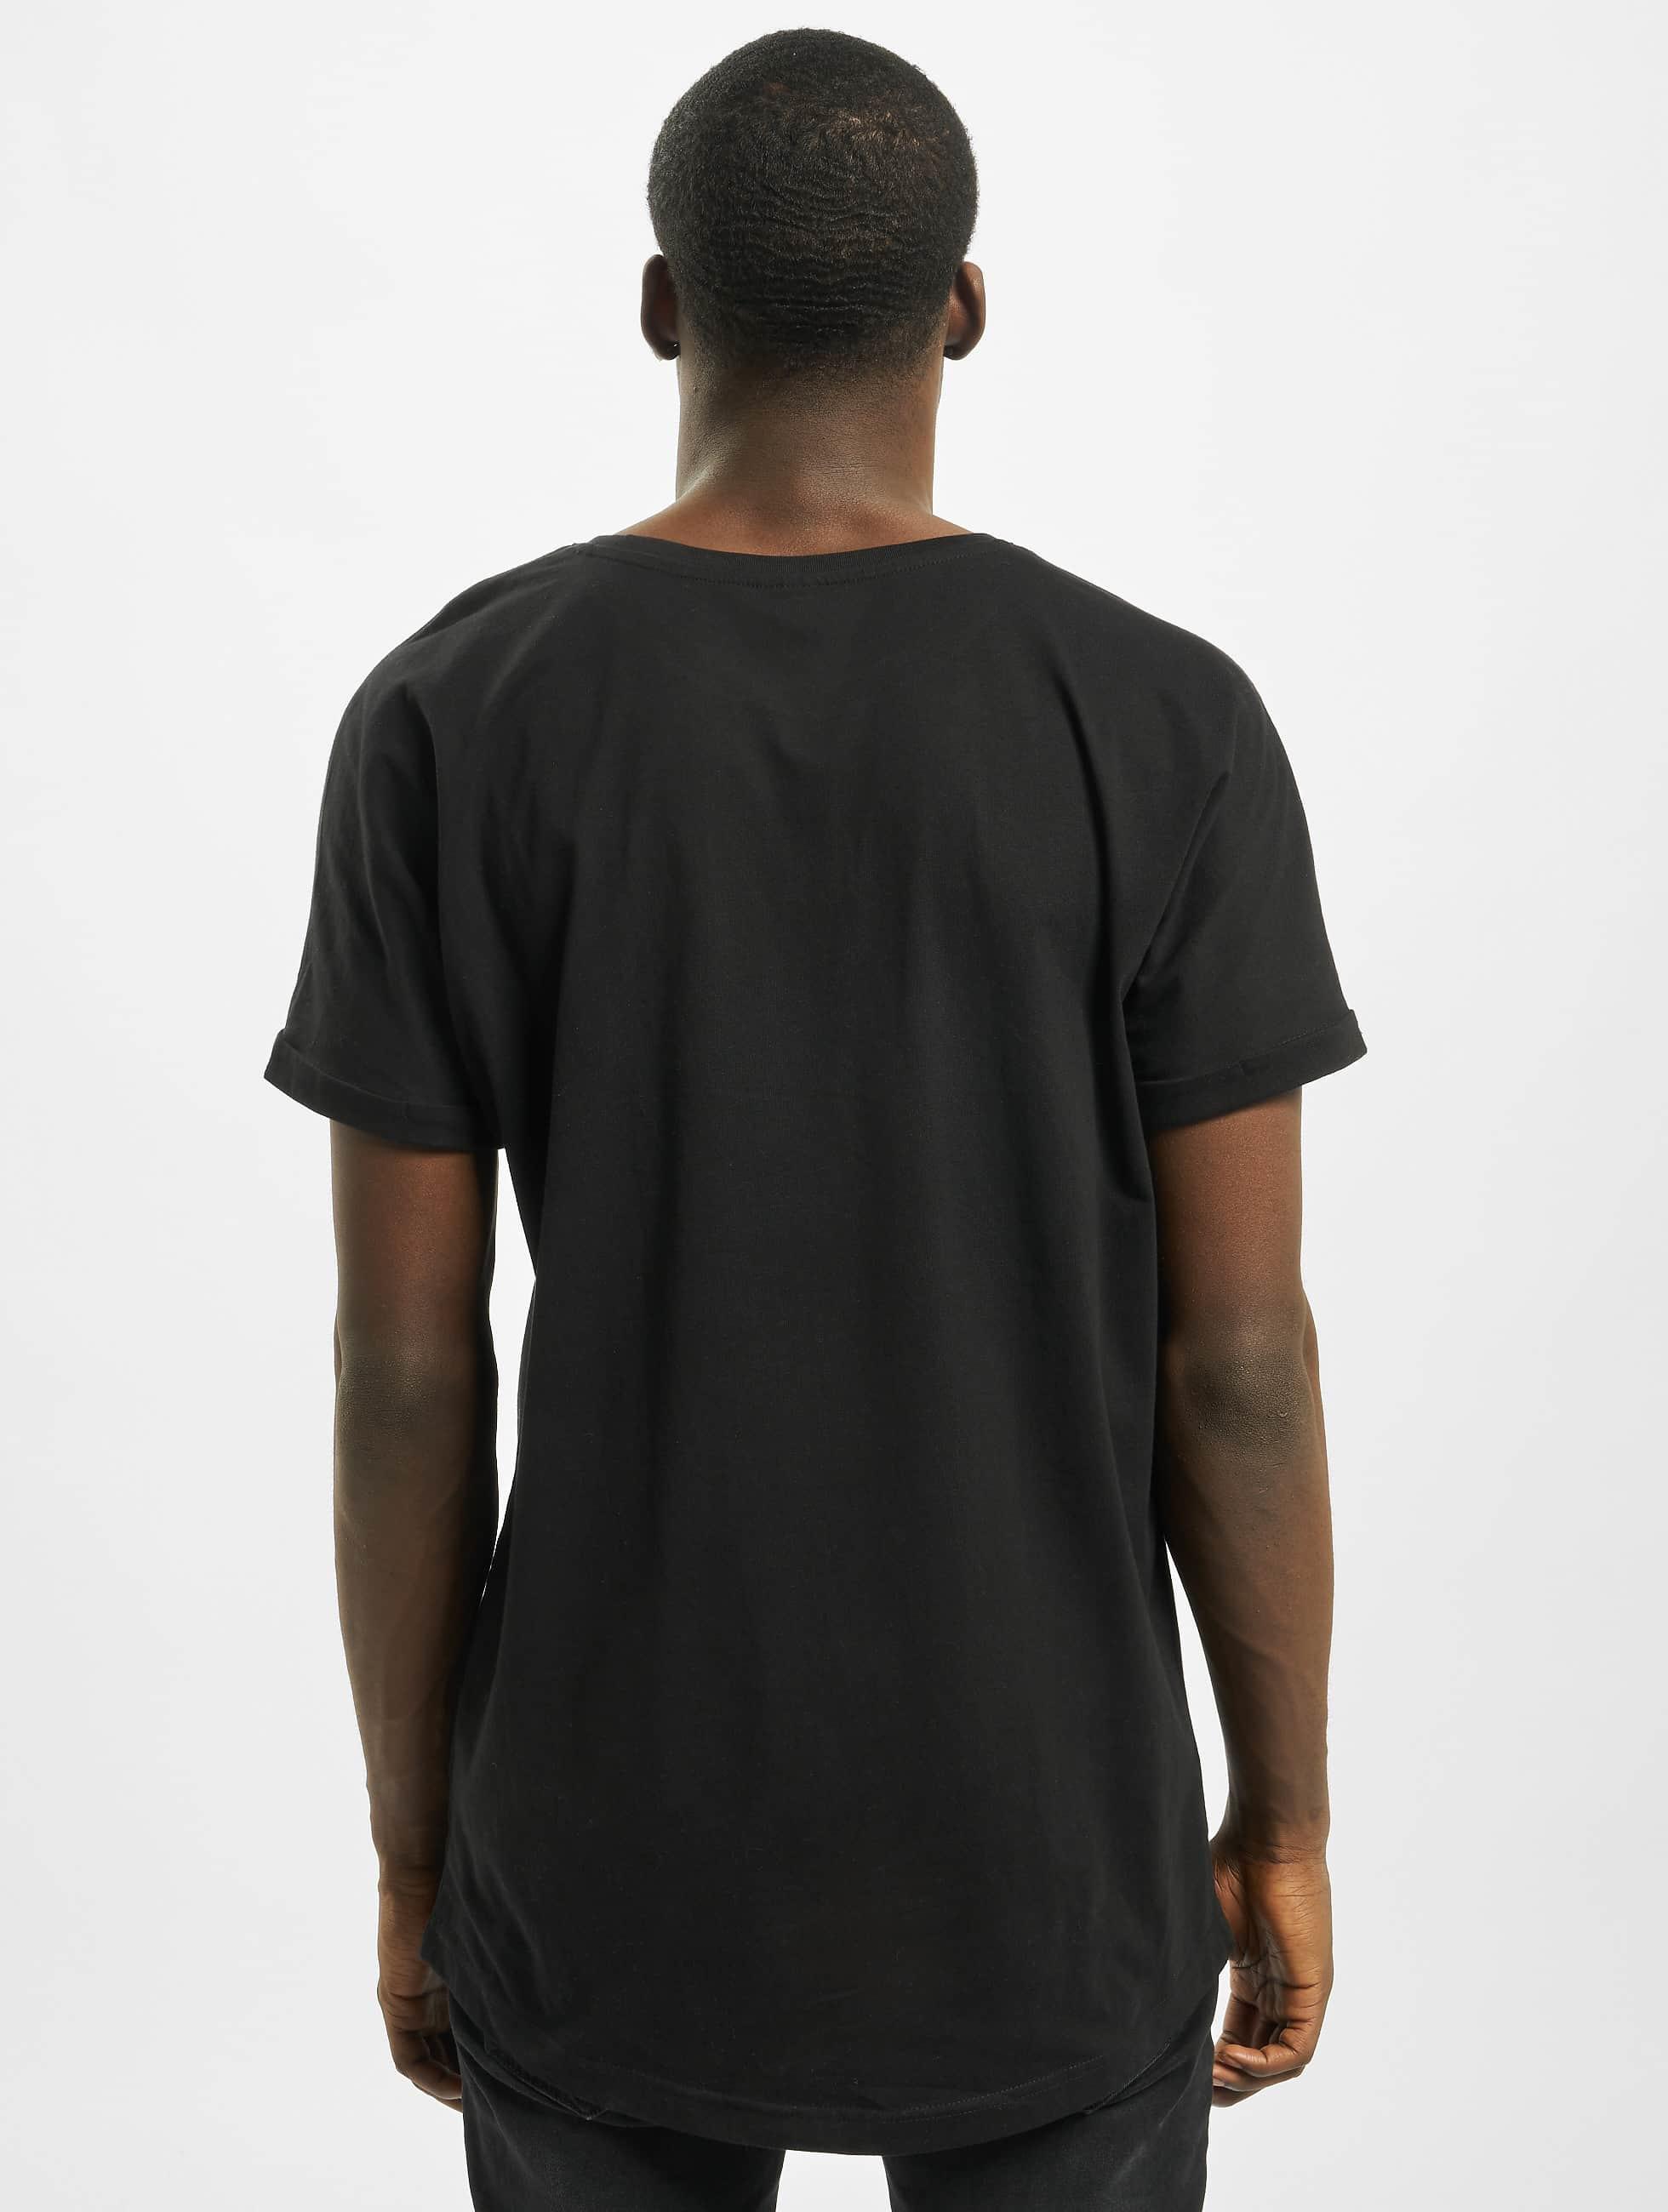 Urban Classics Tall Tees Long Shaped Turnup black